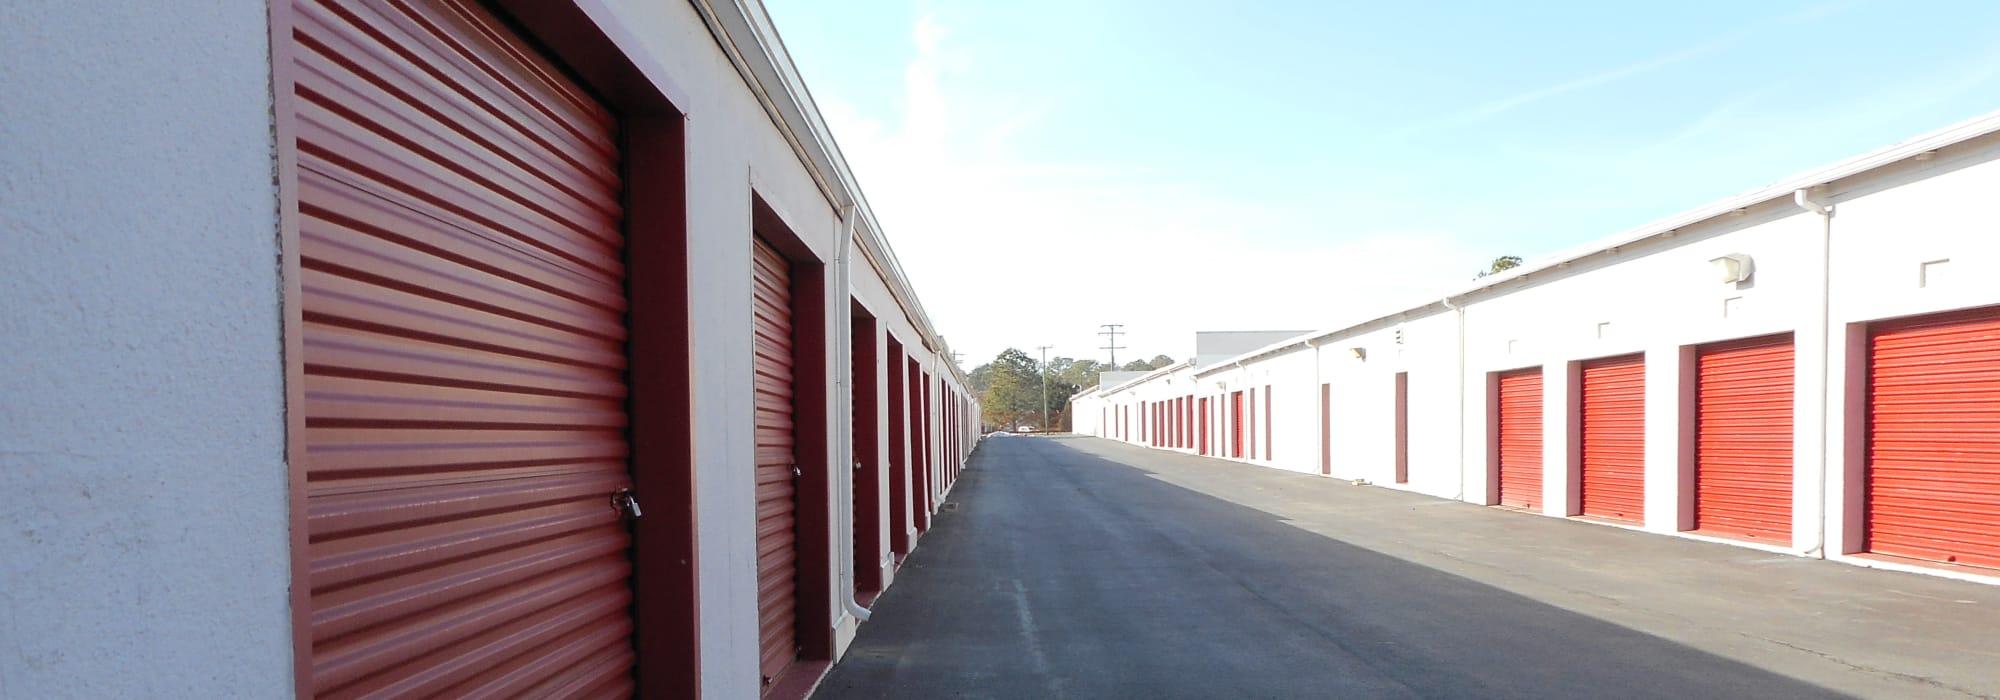 Charmant Prime Storage In Williamsburg, VA